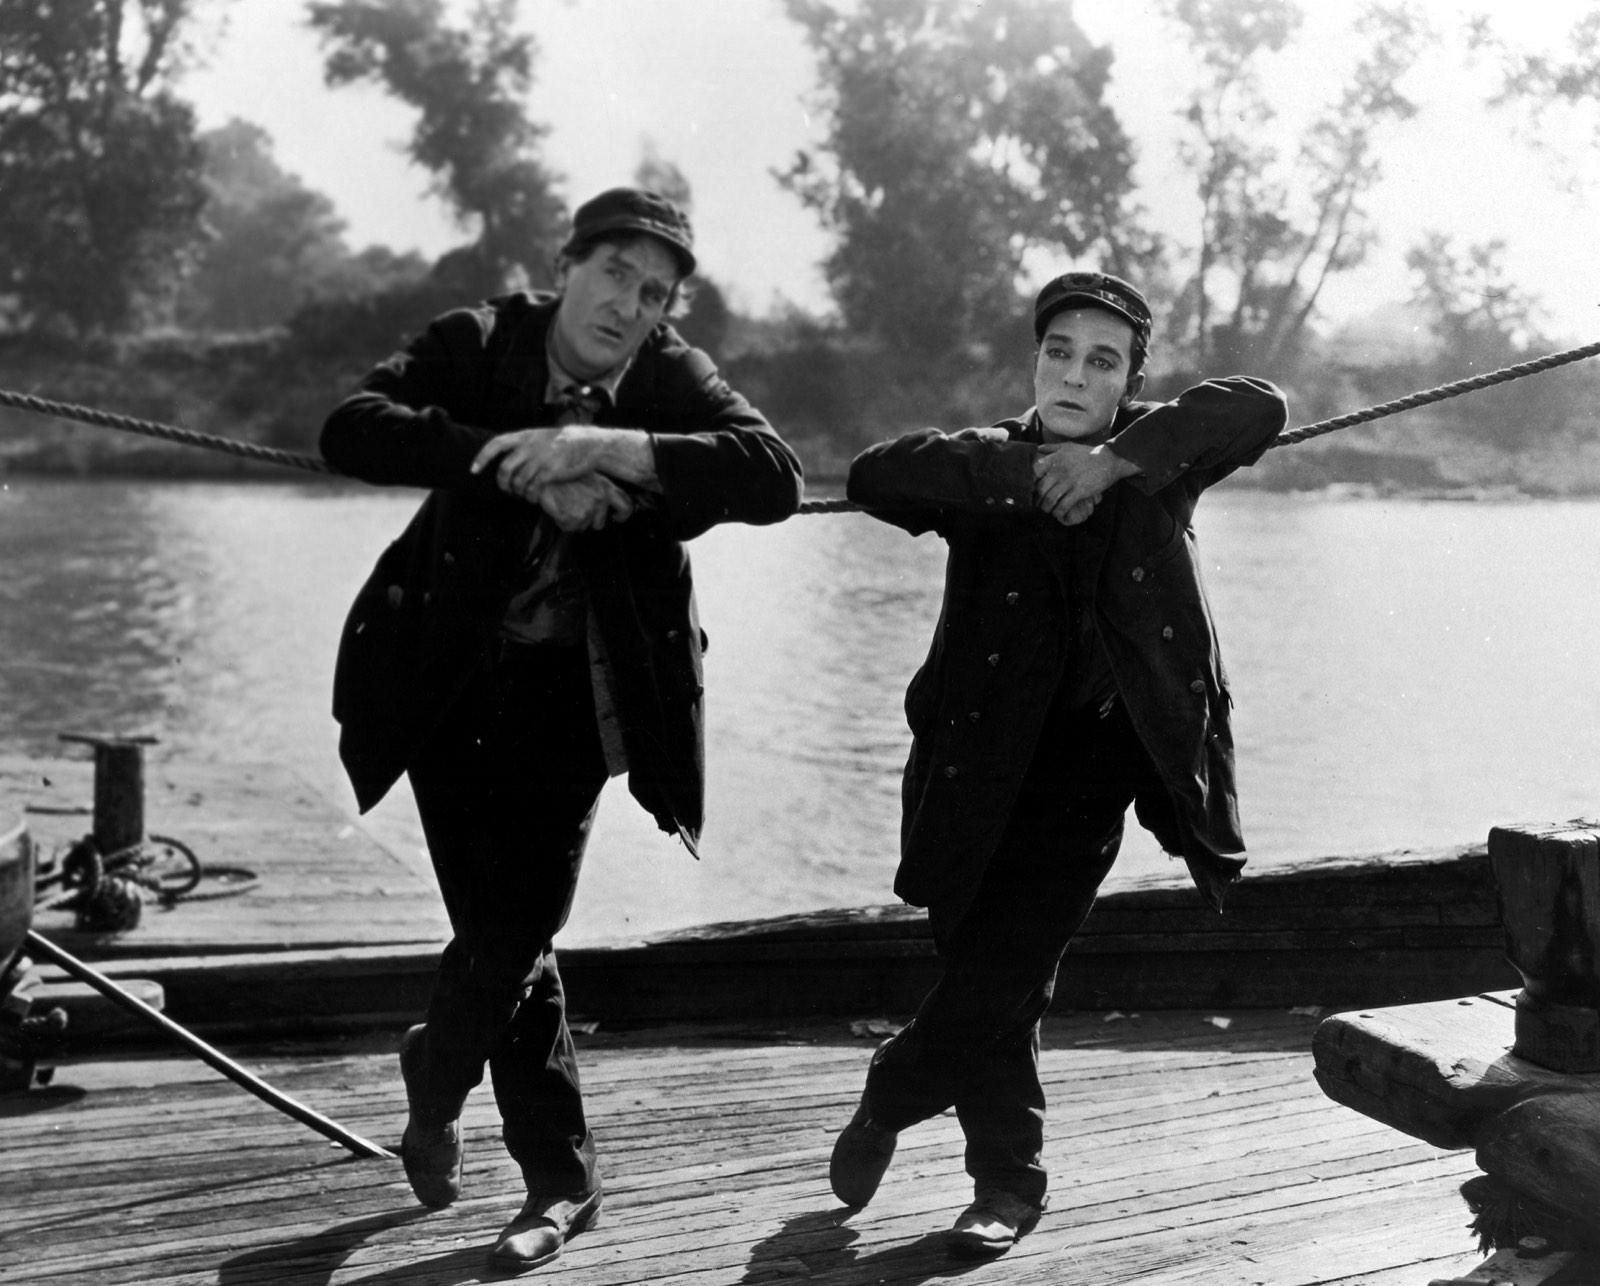 Cinemoments: Steamboat Bill Jr.